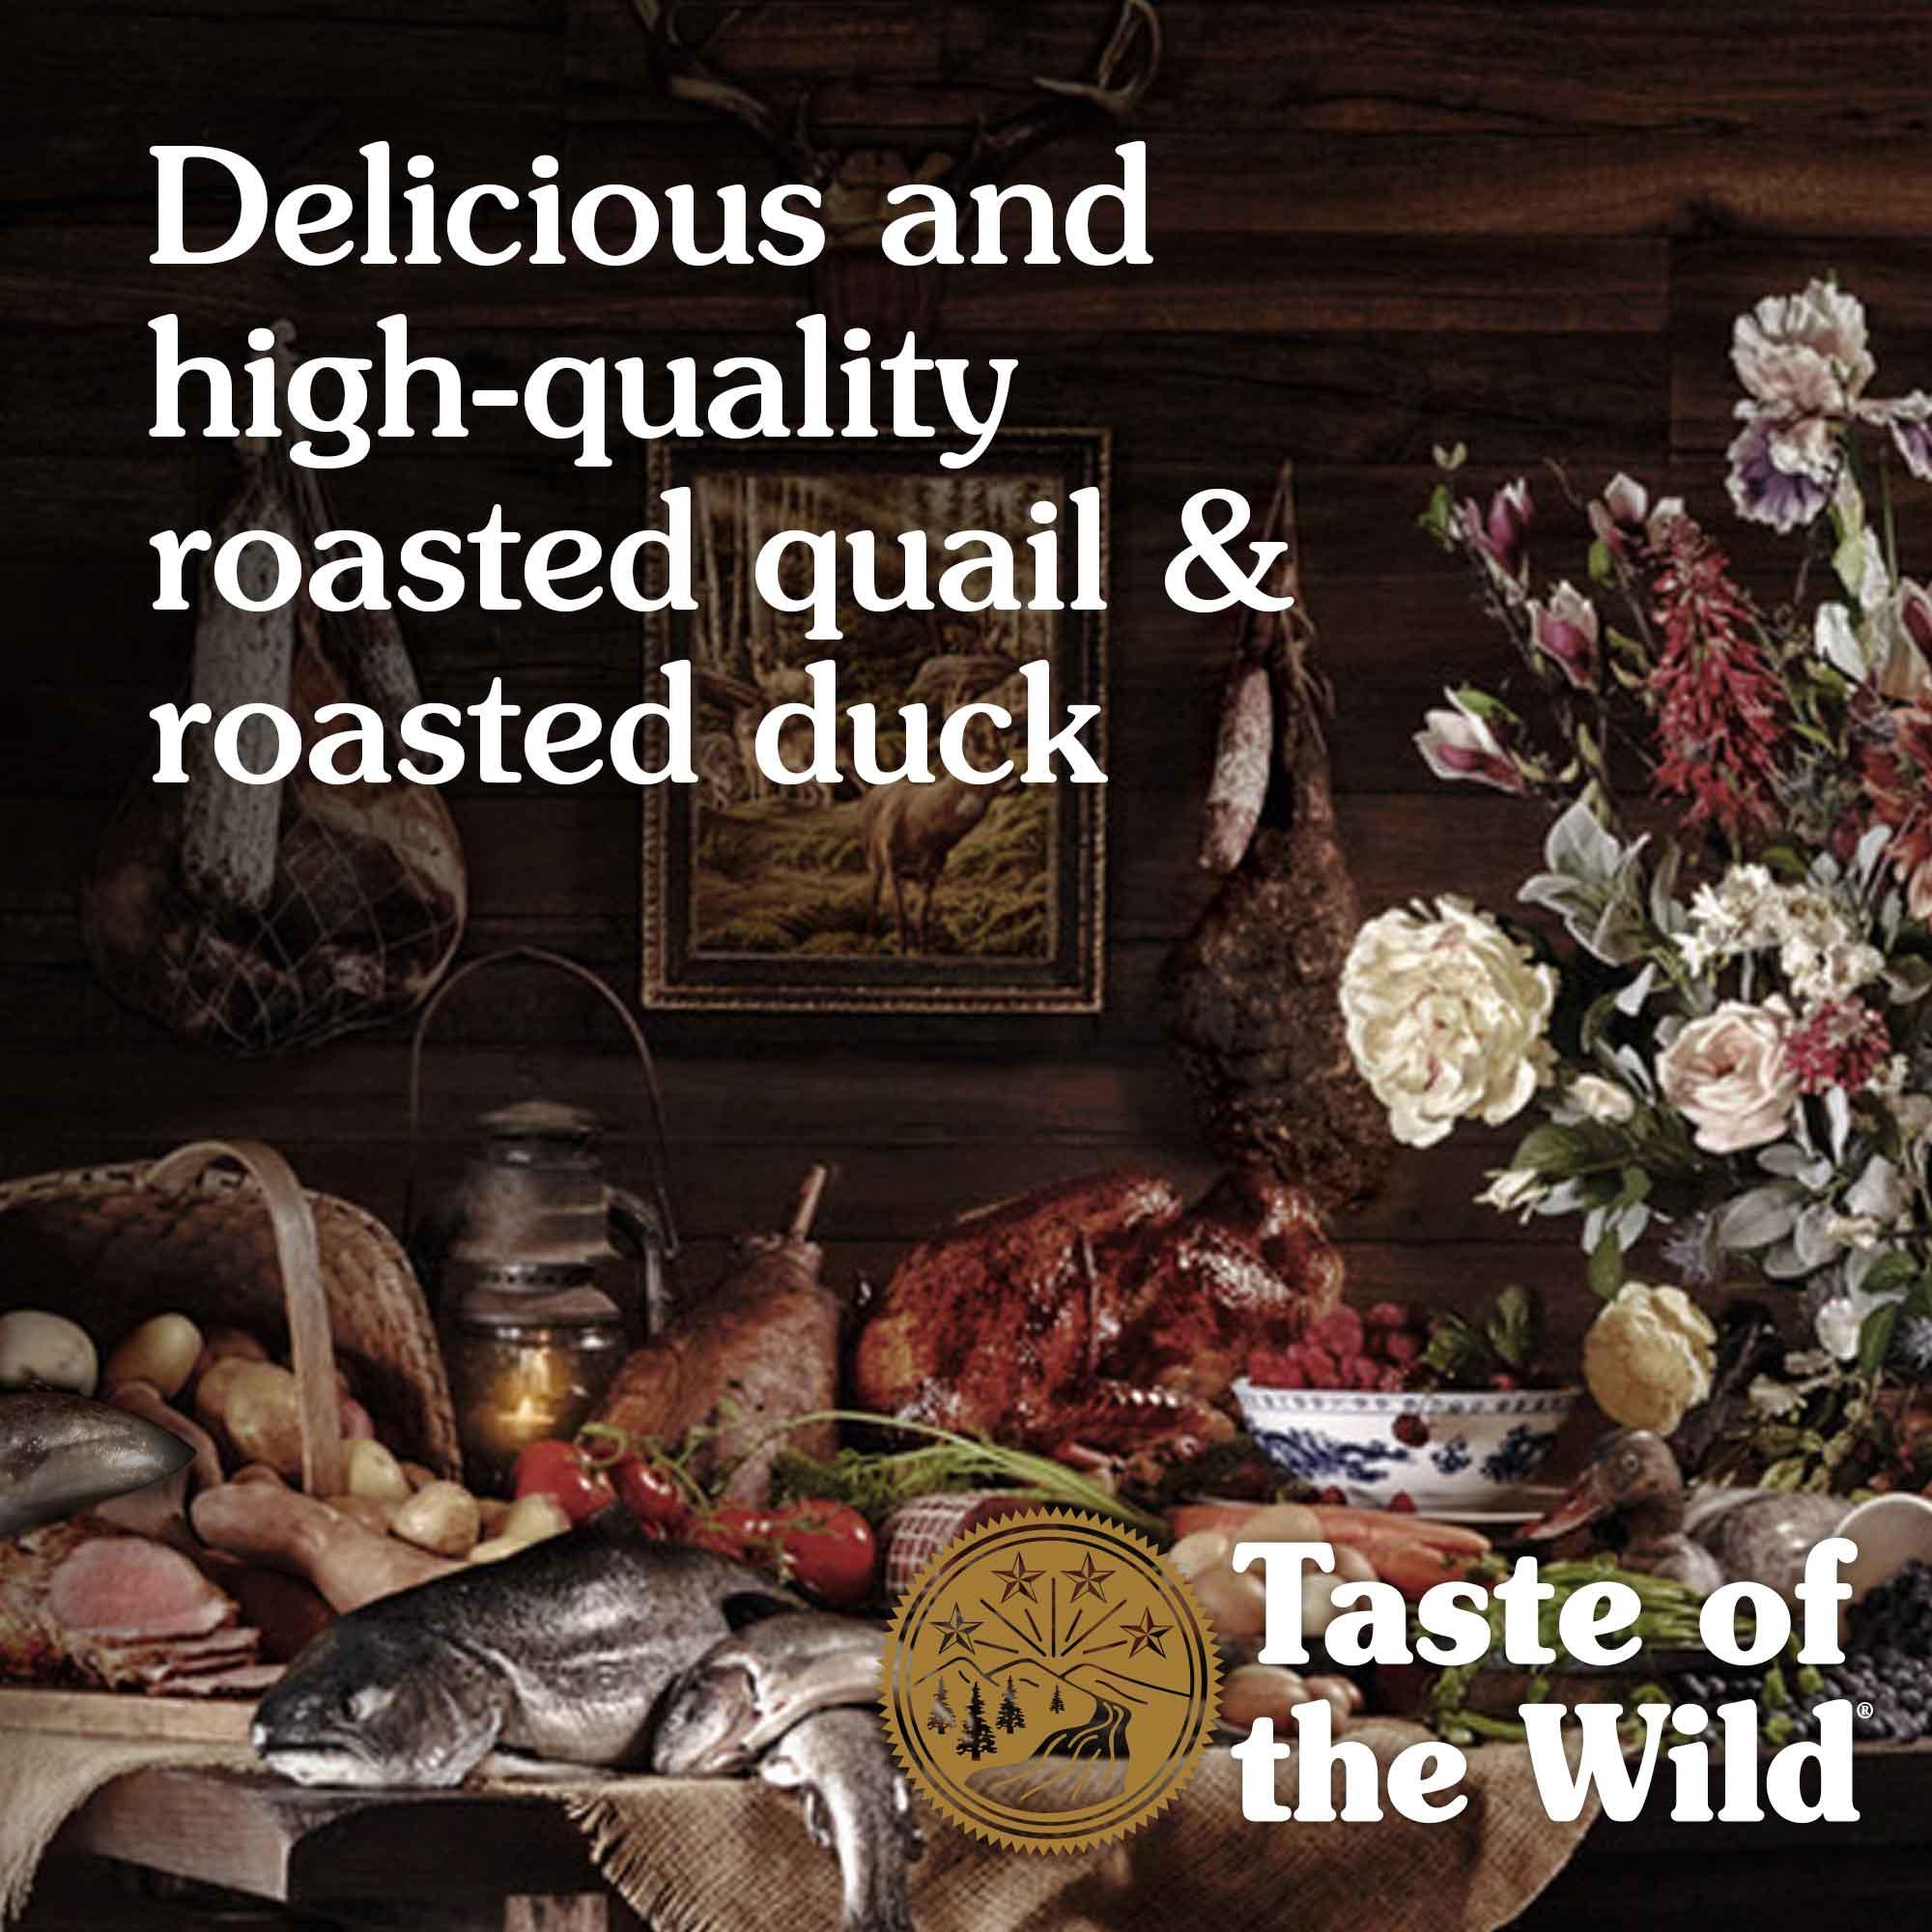 Lowland Creek Roasted Quail & Roasted Duck